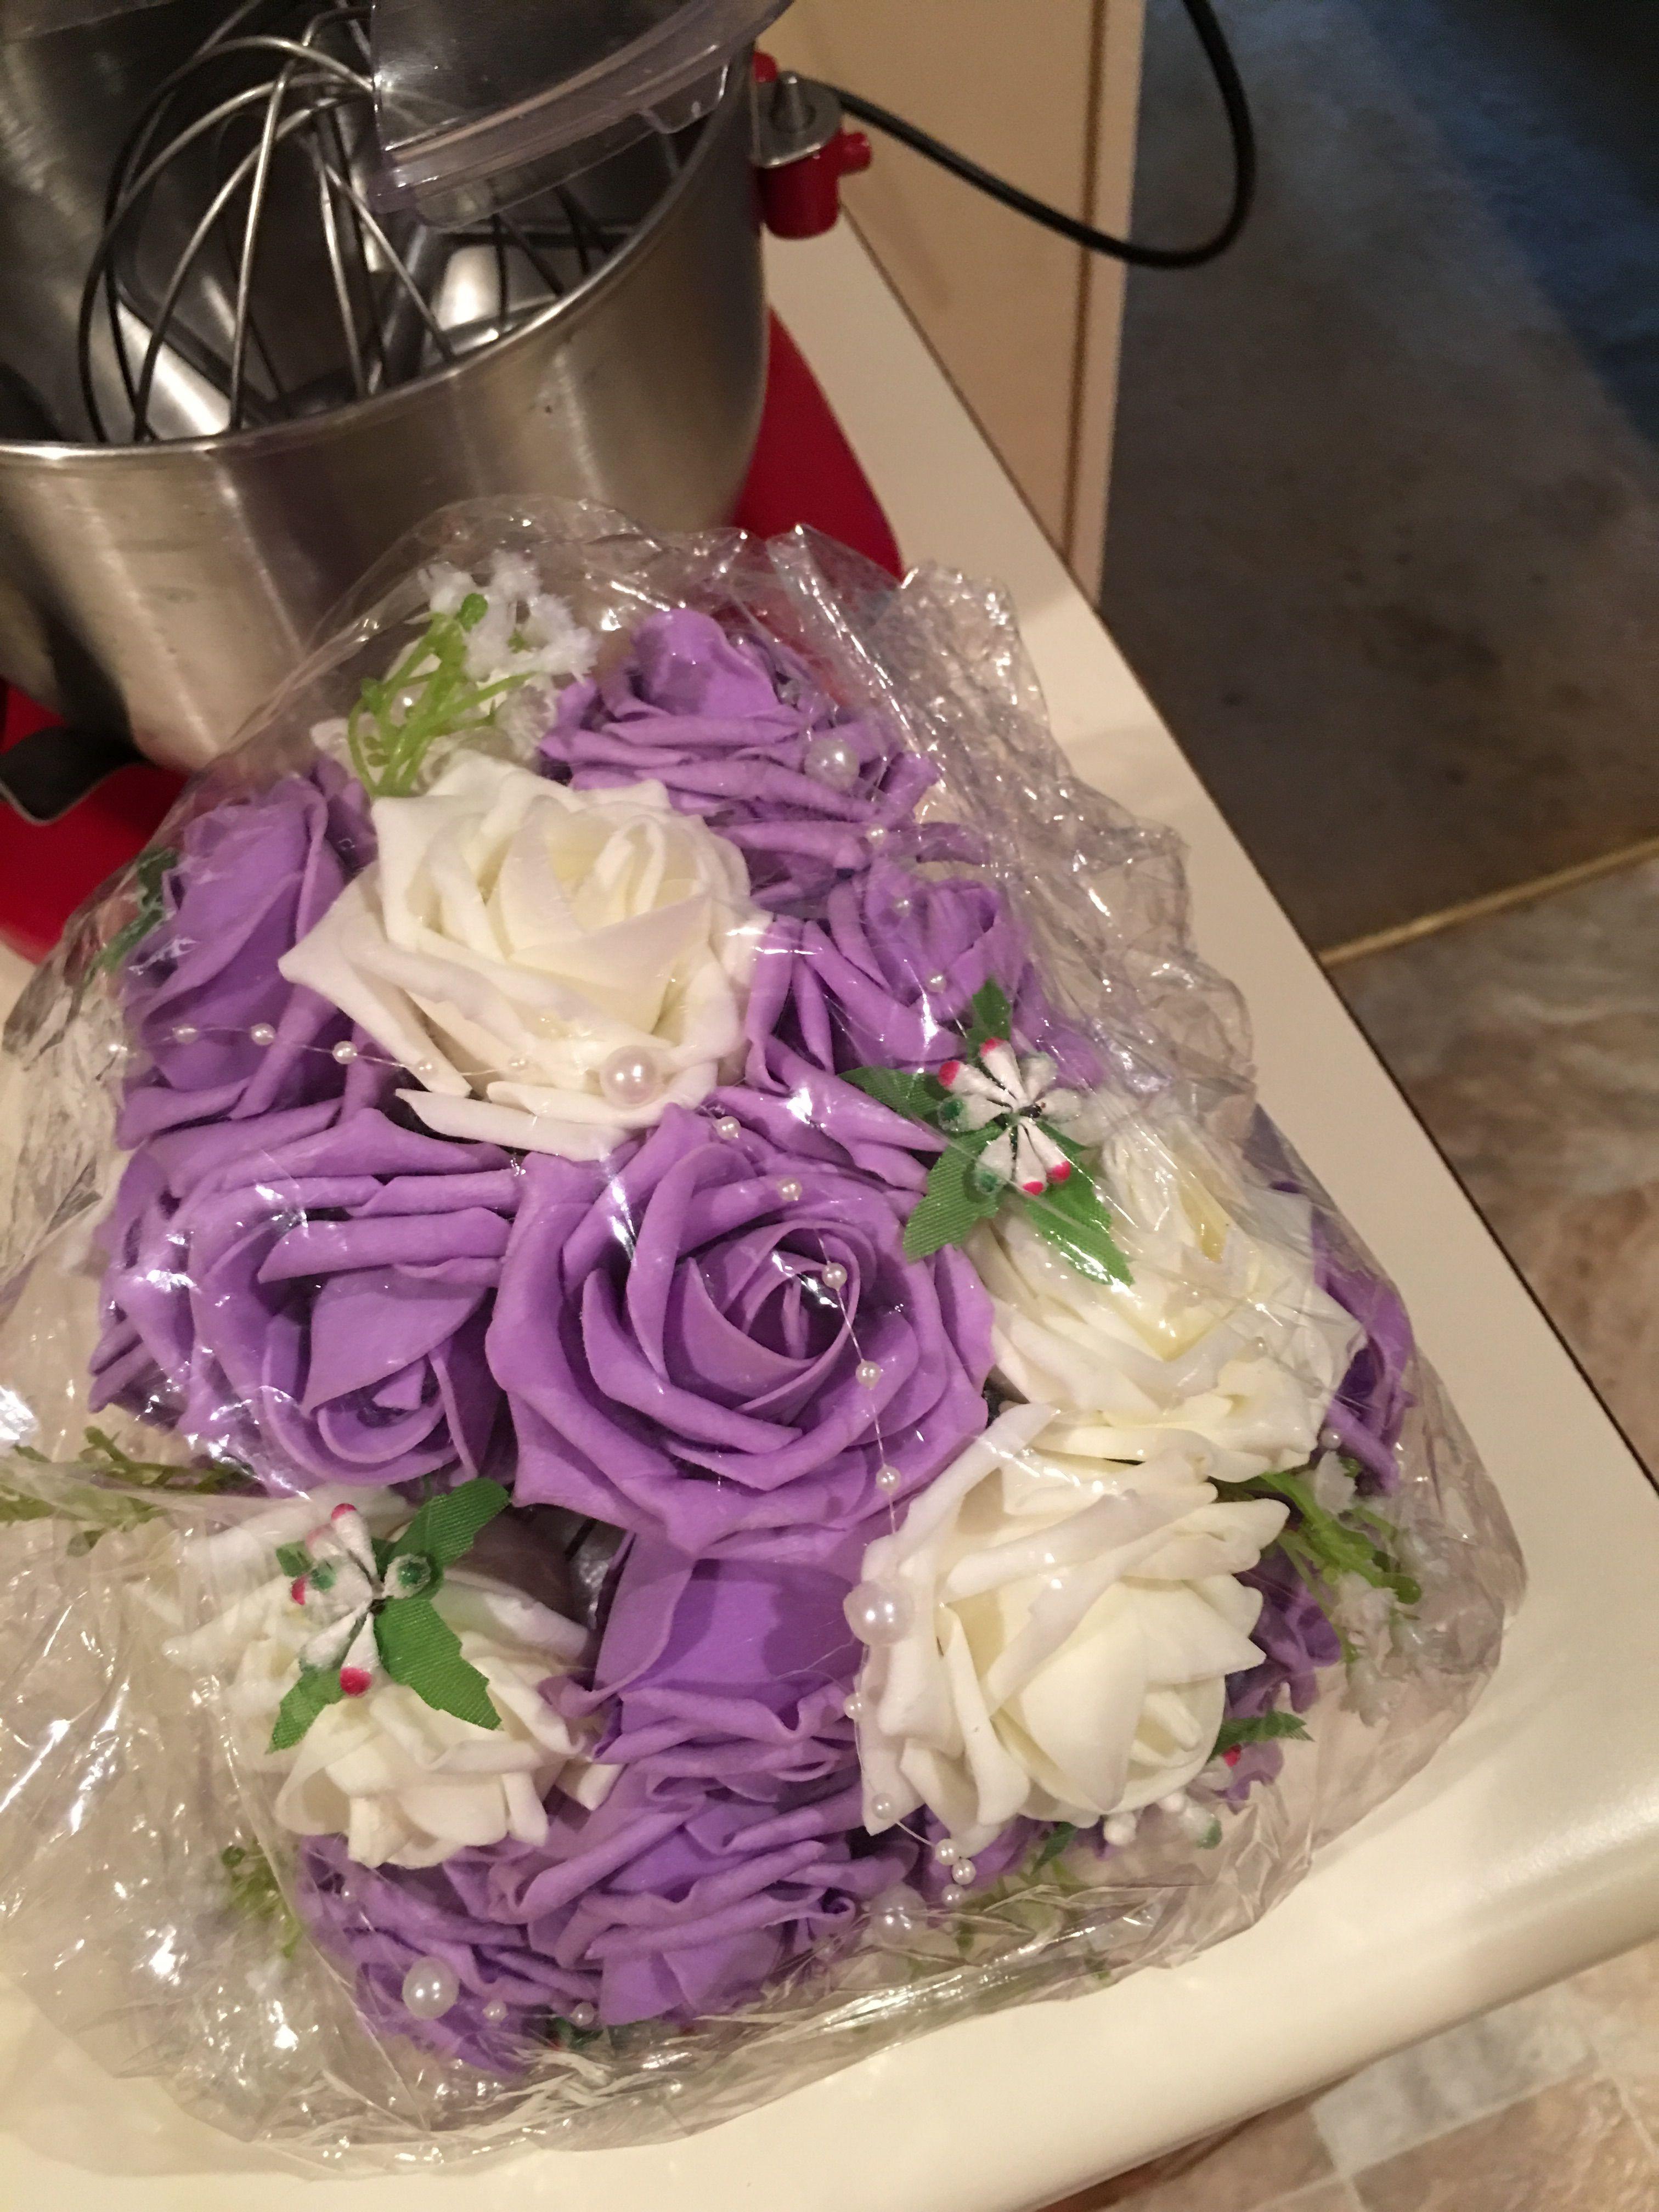 Cheap wedding flowers online silk wedding bouquets ericdress cheap wedding flowers online silk wedding bouquets ericdress mightylinksfo